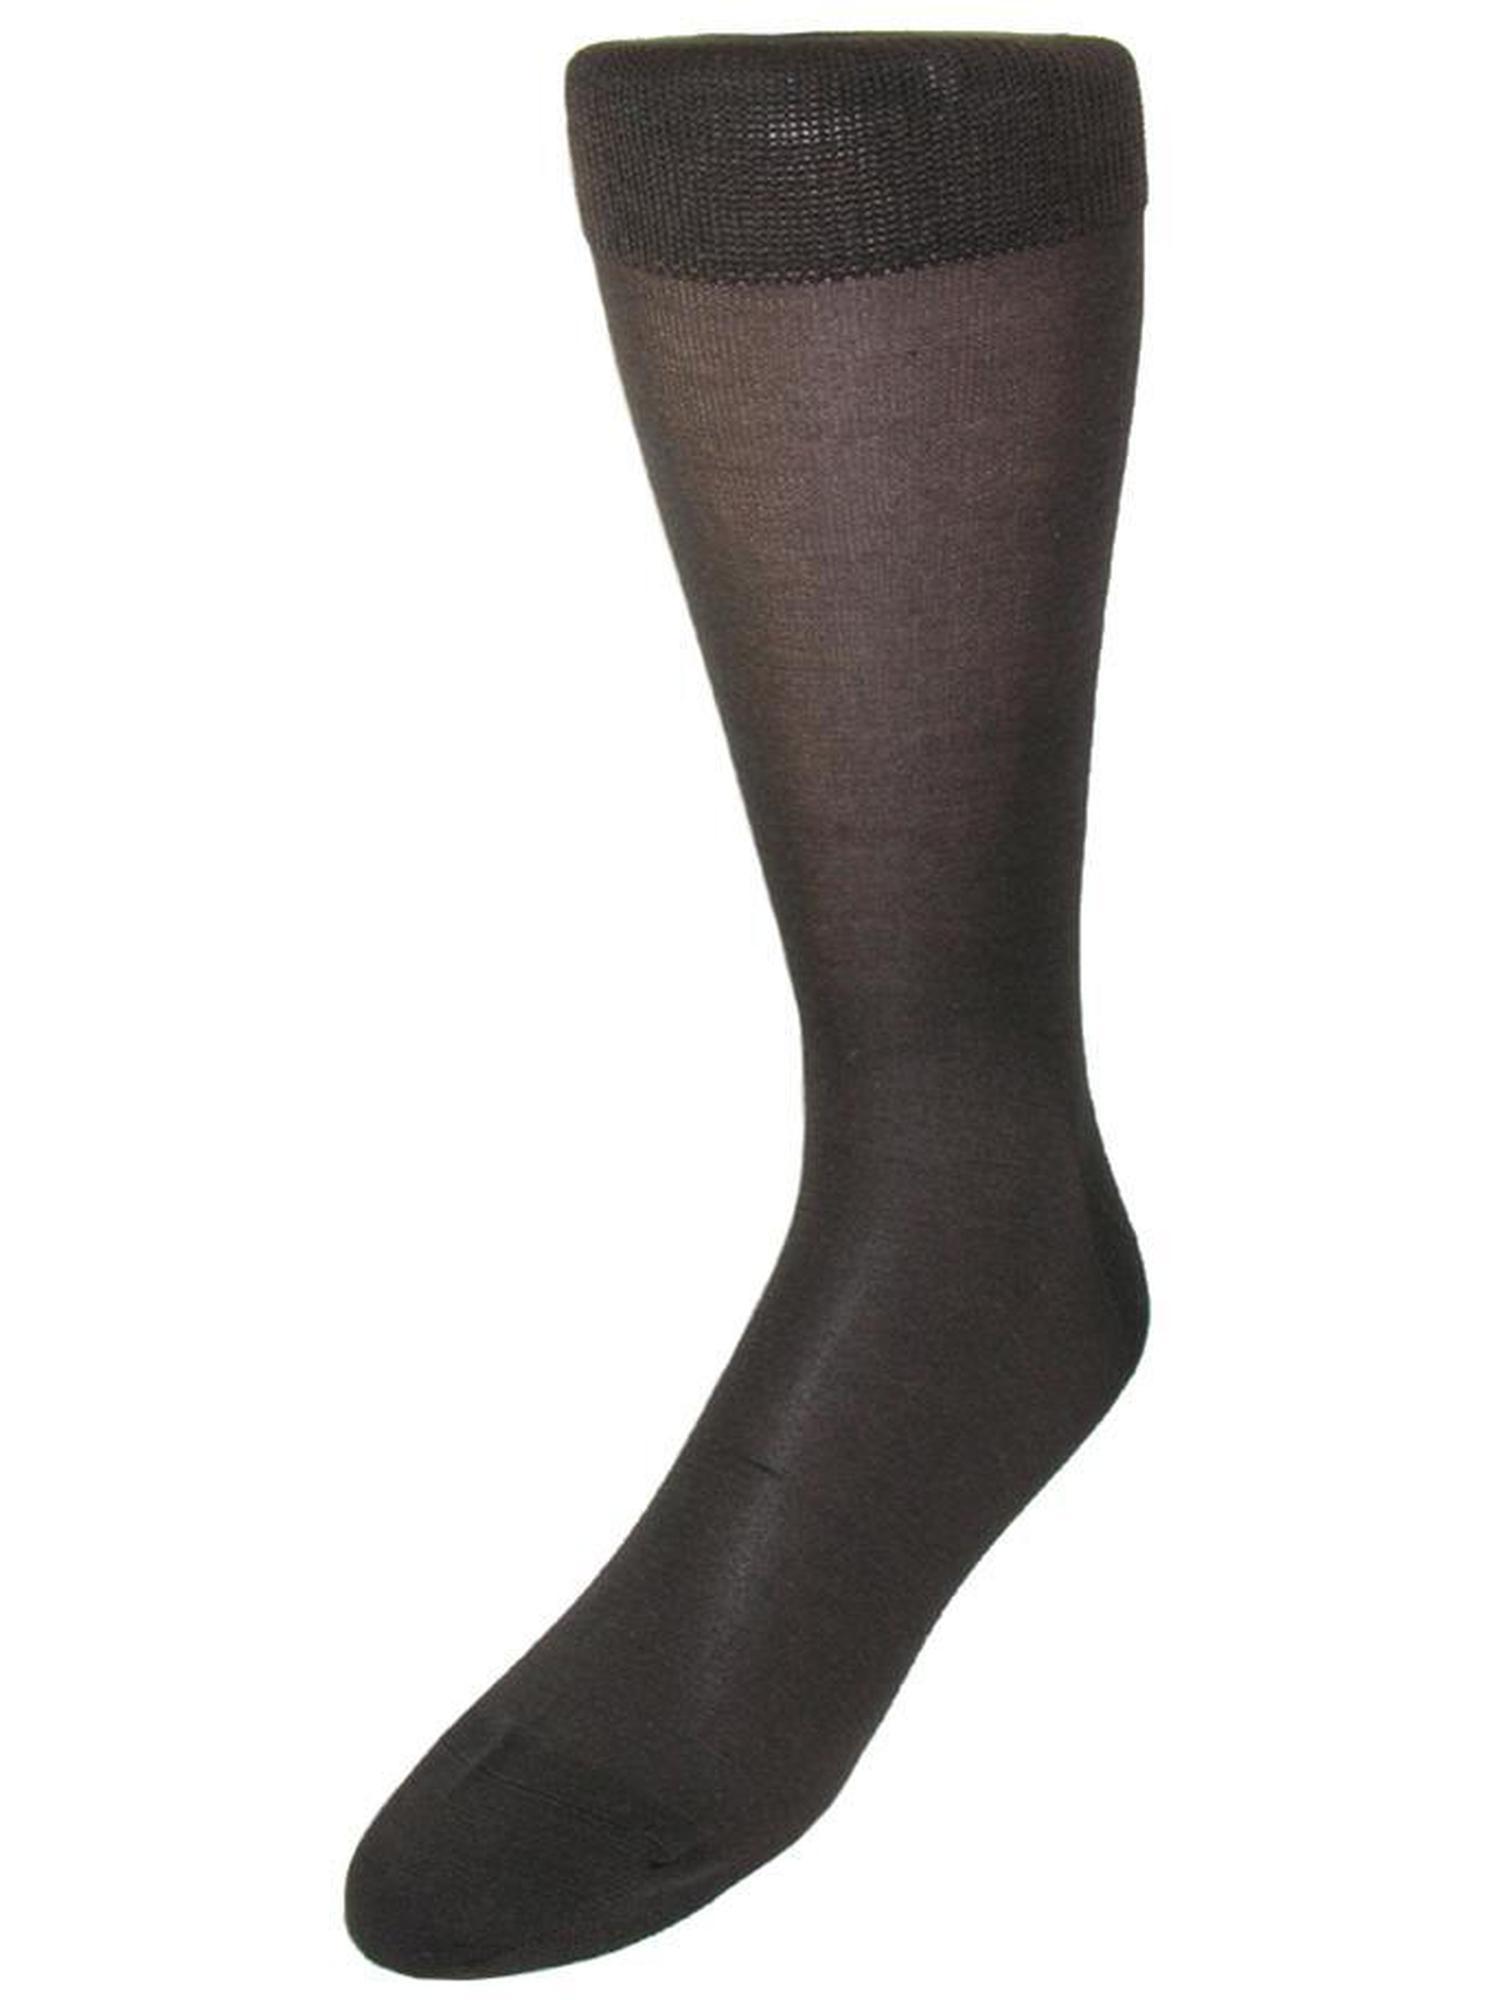 Mens Silk Mid Calf Dress Socks, Brown